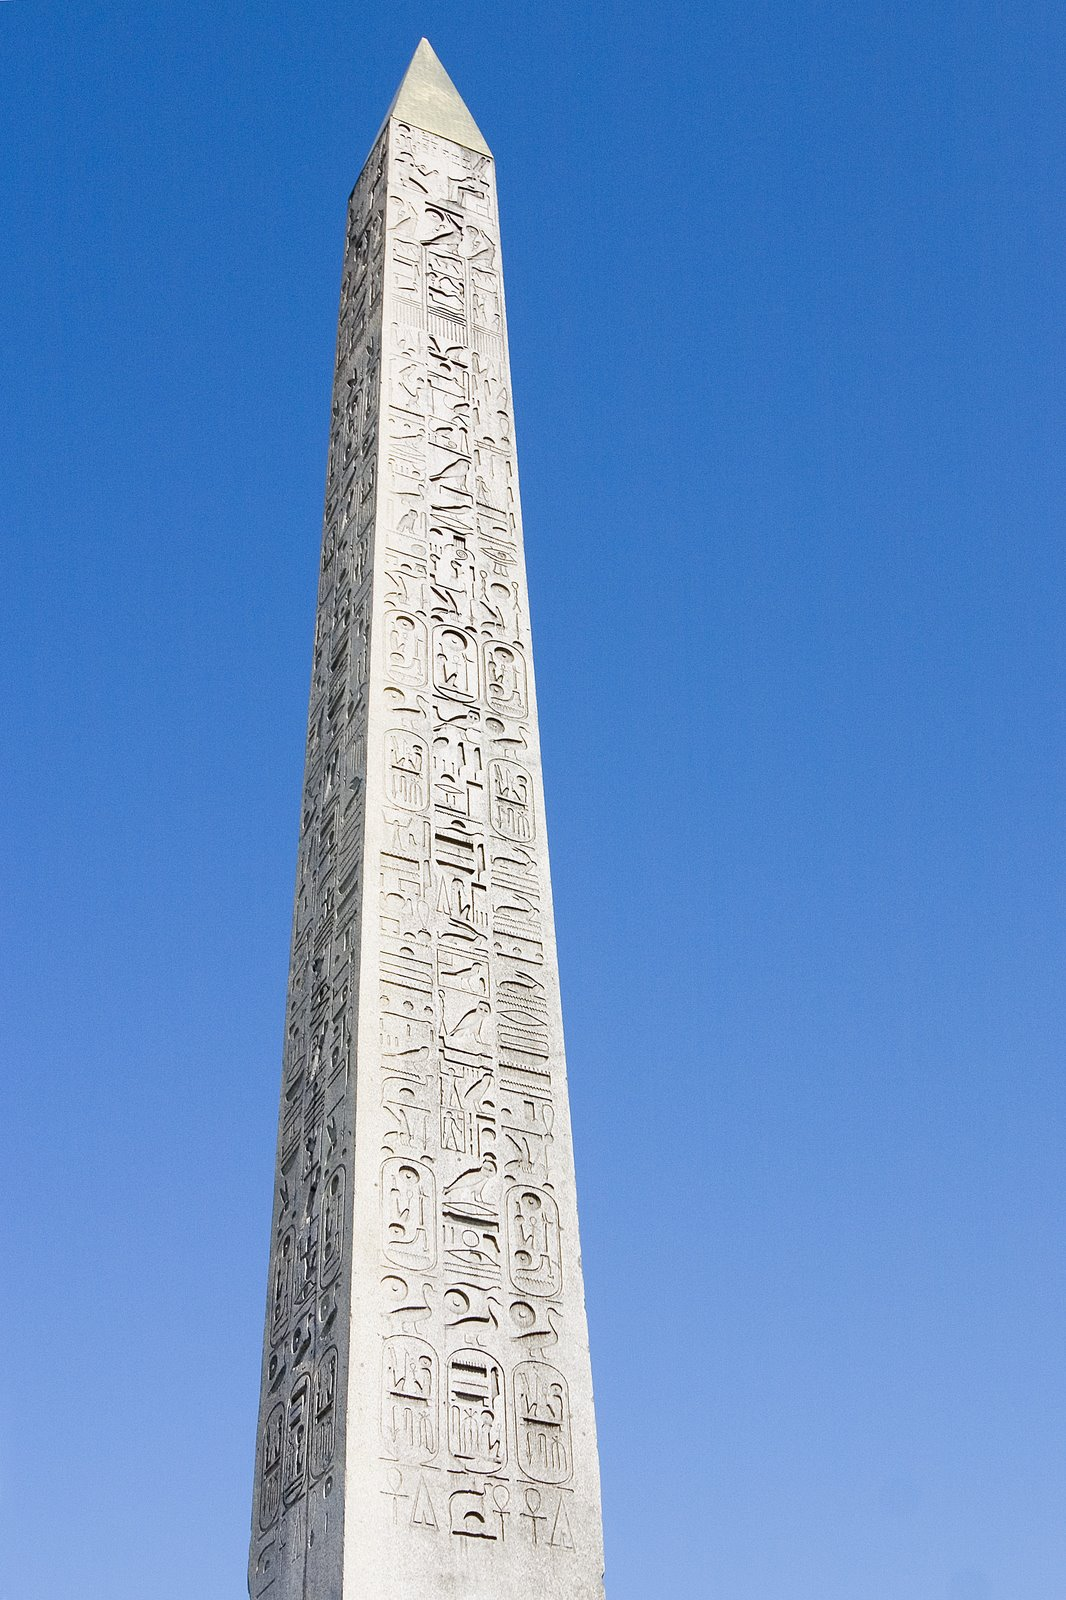 Wooden Obelisk Plans Free Download Hall Tree Coat Rack